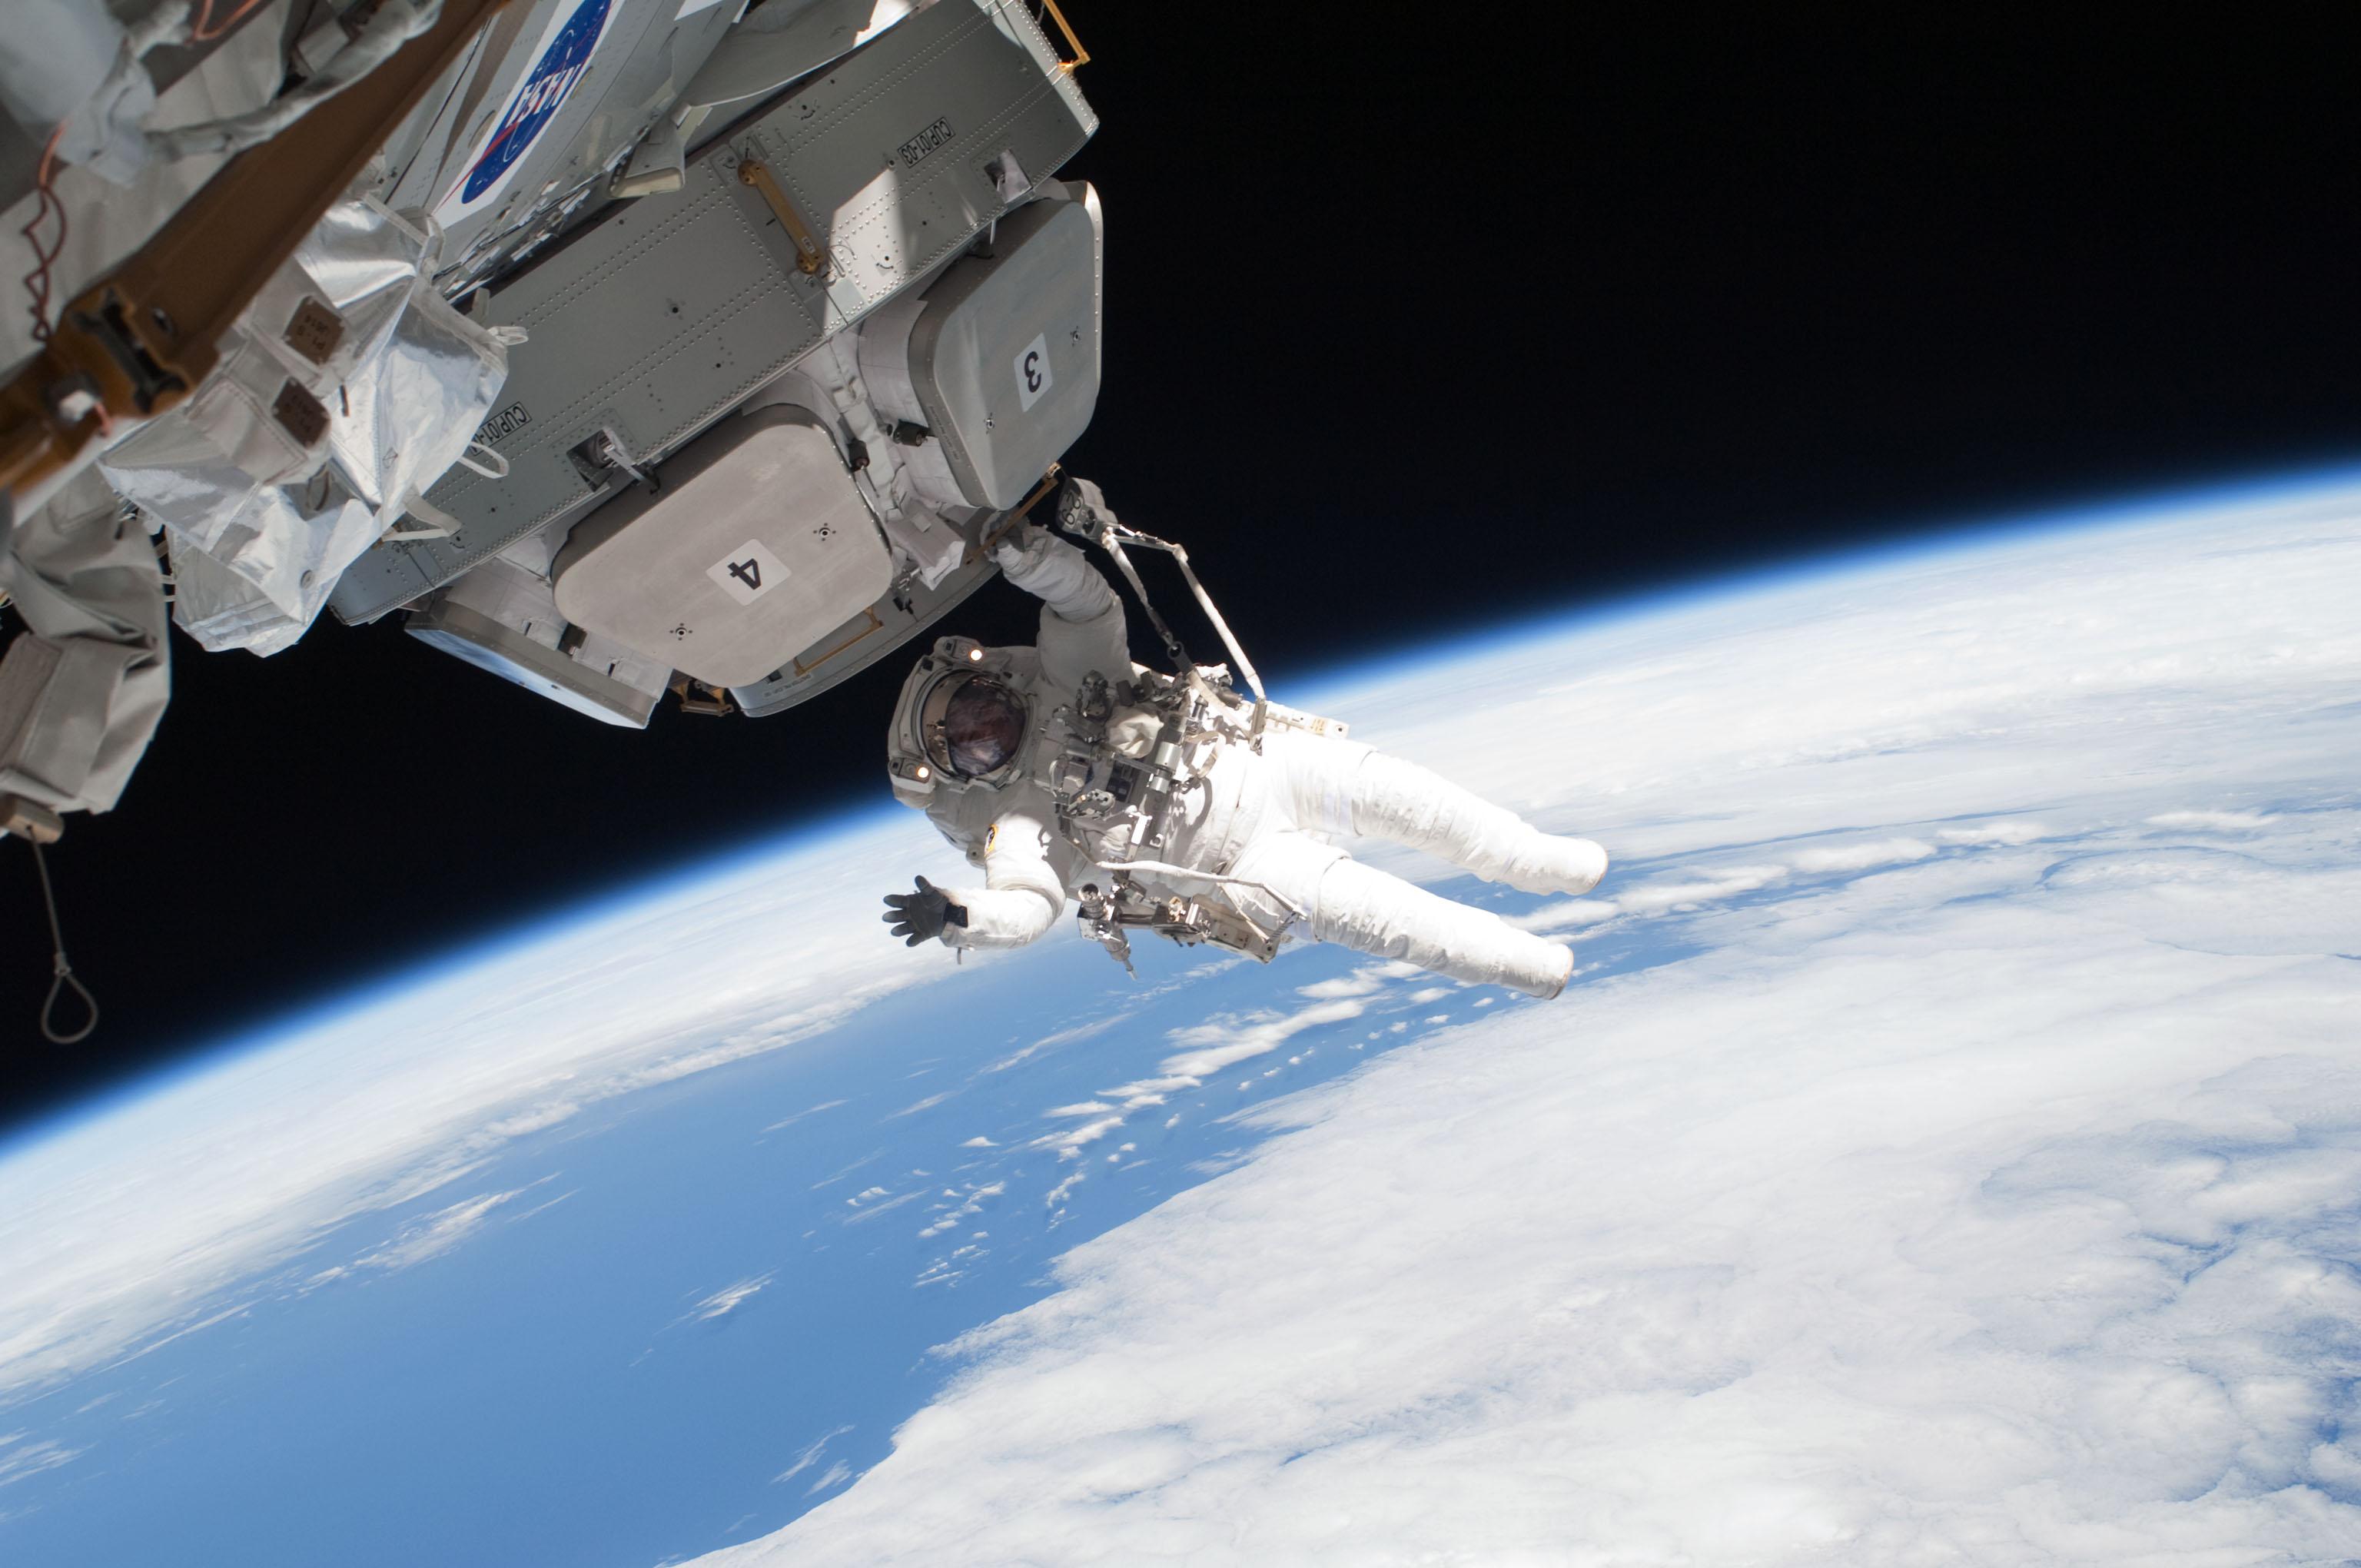 Iss Wallpaper Hd Nasa Astronaut Nicholas Patrick Full Hd Wallpaper And